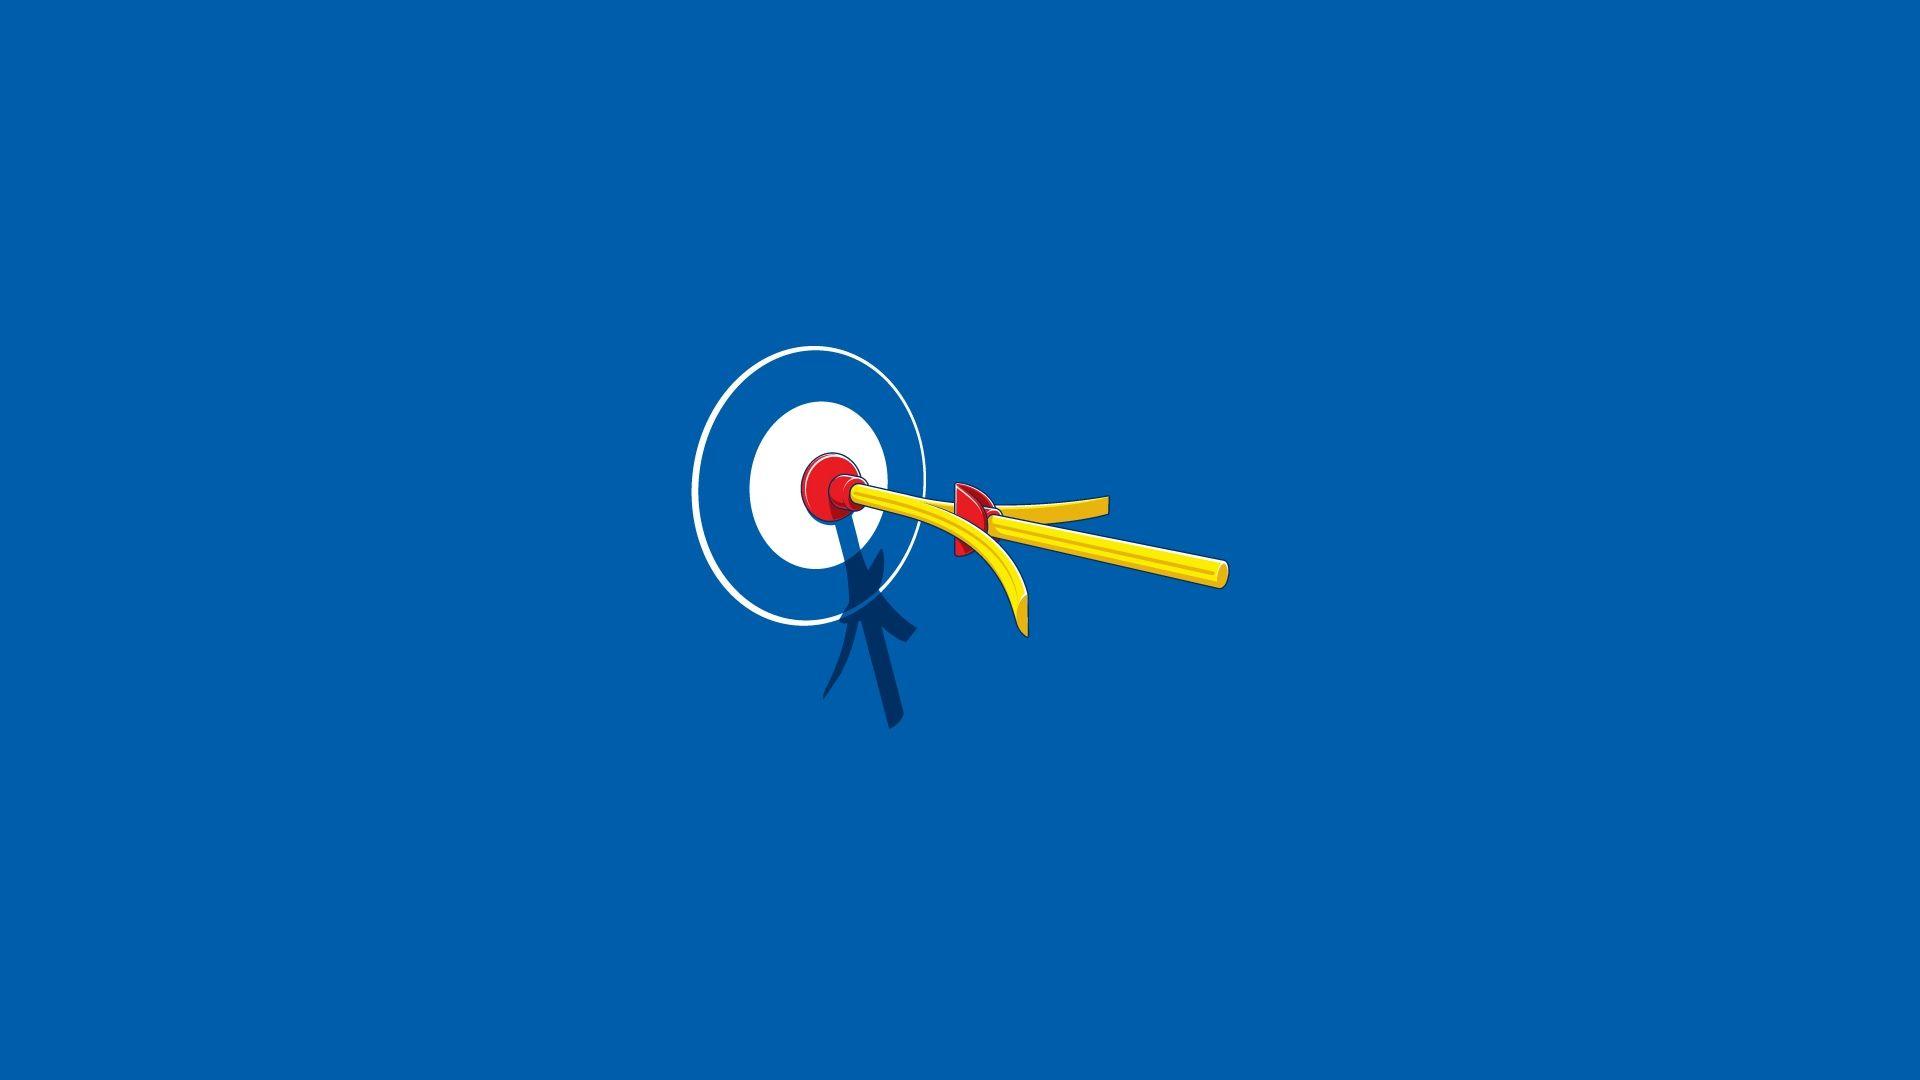 Minimalist Wallpaper Fall Archery Wallpaper Hd Pixelstalk Net